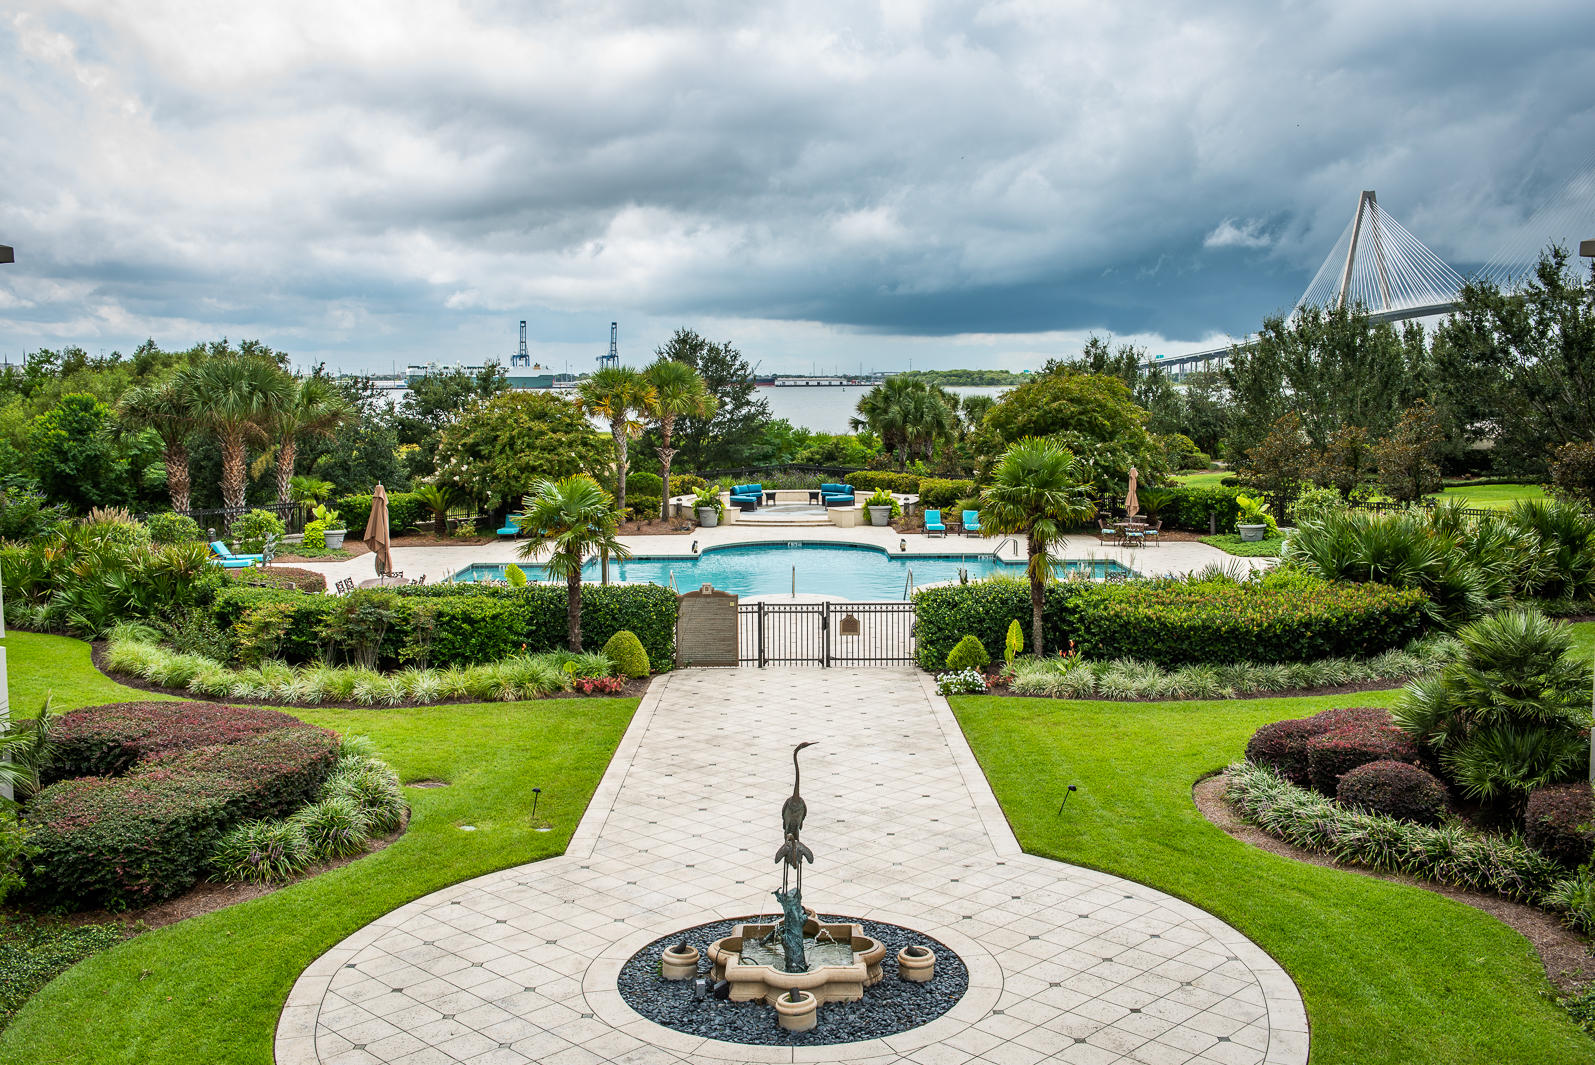 Renaissance On Chas Harbor Homes For Sale - 144 Plaza, Mount Pleasant, SC - 14